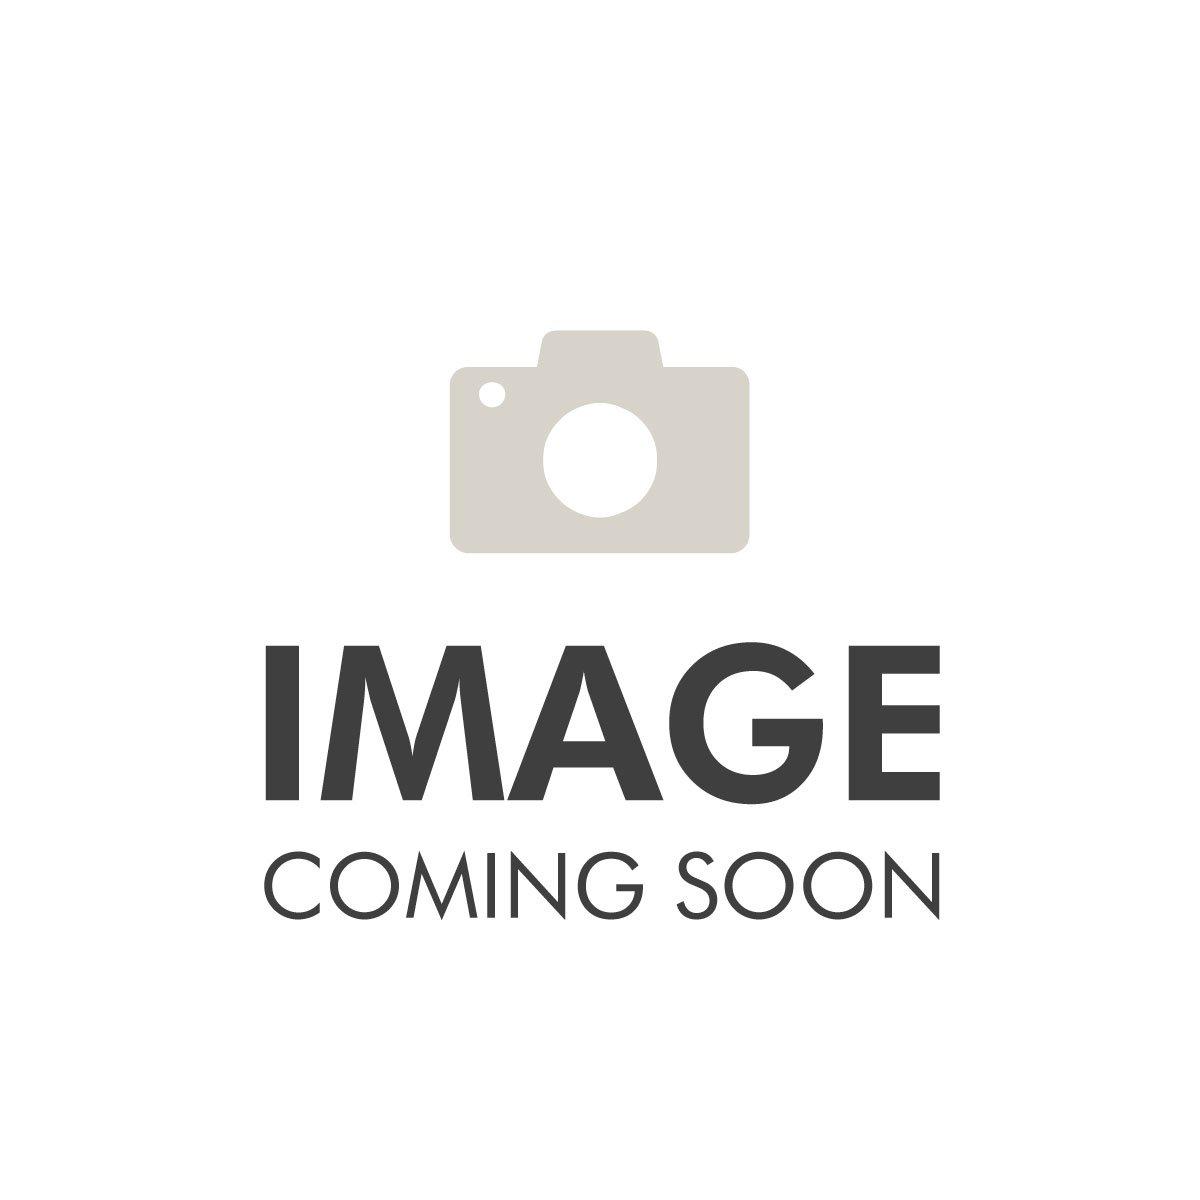 Kerastase Nutritive Lait Vital 200ml Incredibly Light - For Normal To Slightly Dry Hair